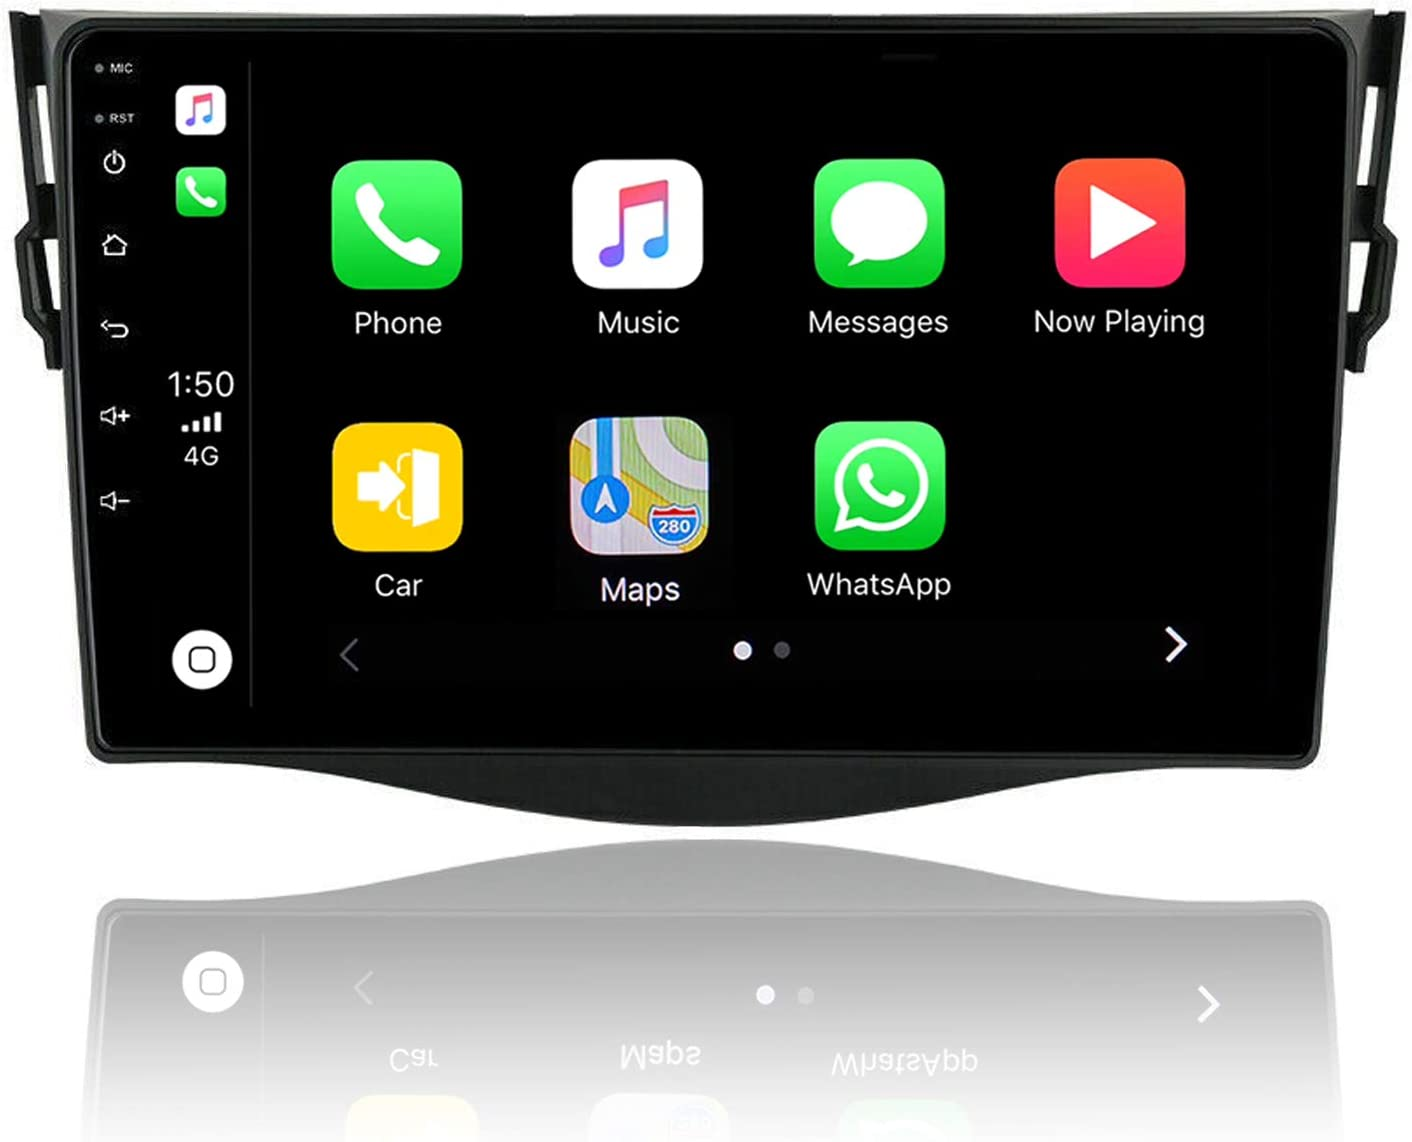 ViaBecs 9 inch Android 10.0 Head Unit Apple Carplay Audio for Toyota RAV 4 RAV4 2006-2012 Car Stereo Bluetooth 5.0 4GB 64GB DSP Support Handsfree Calling Android Auto GPS SWC Split Screen